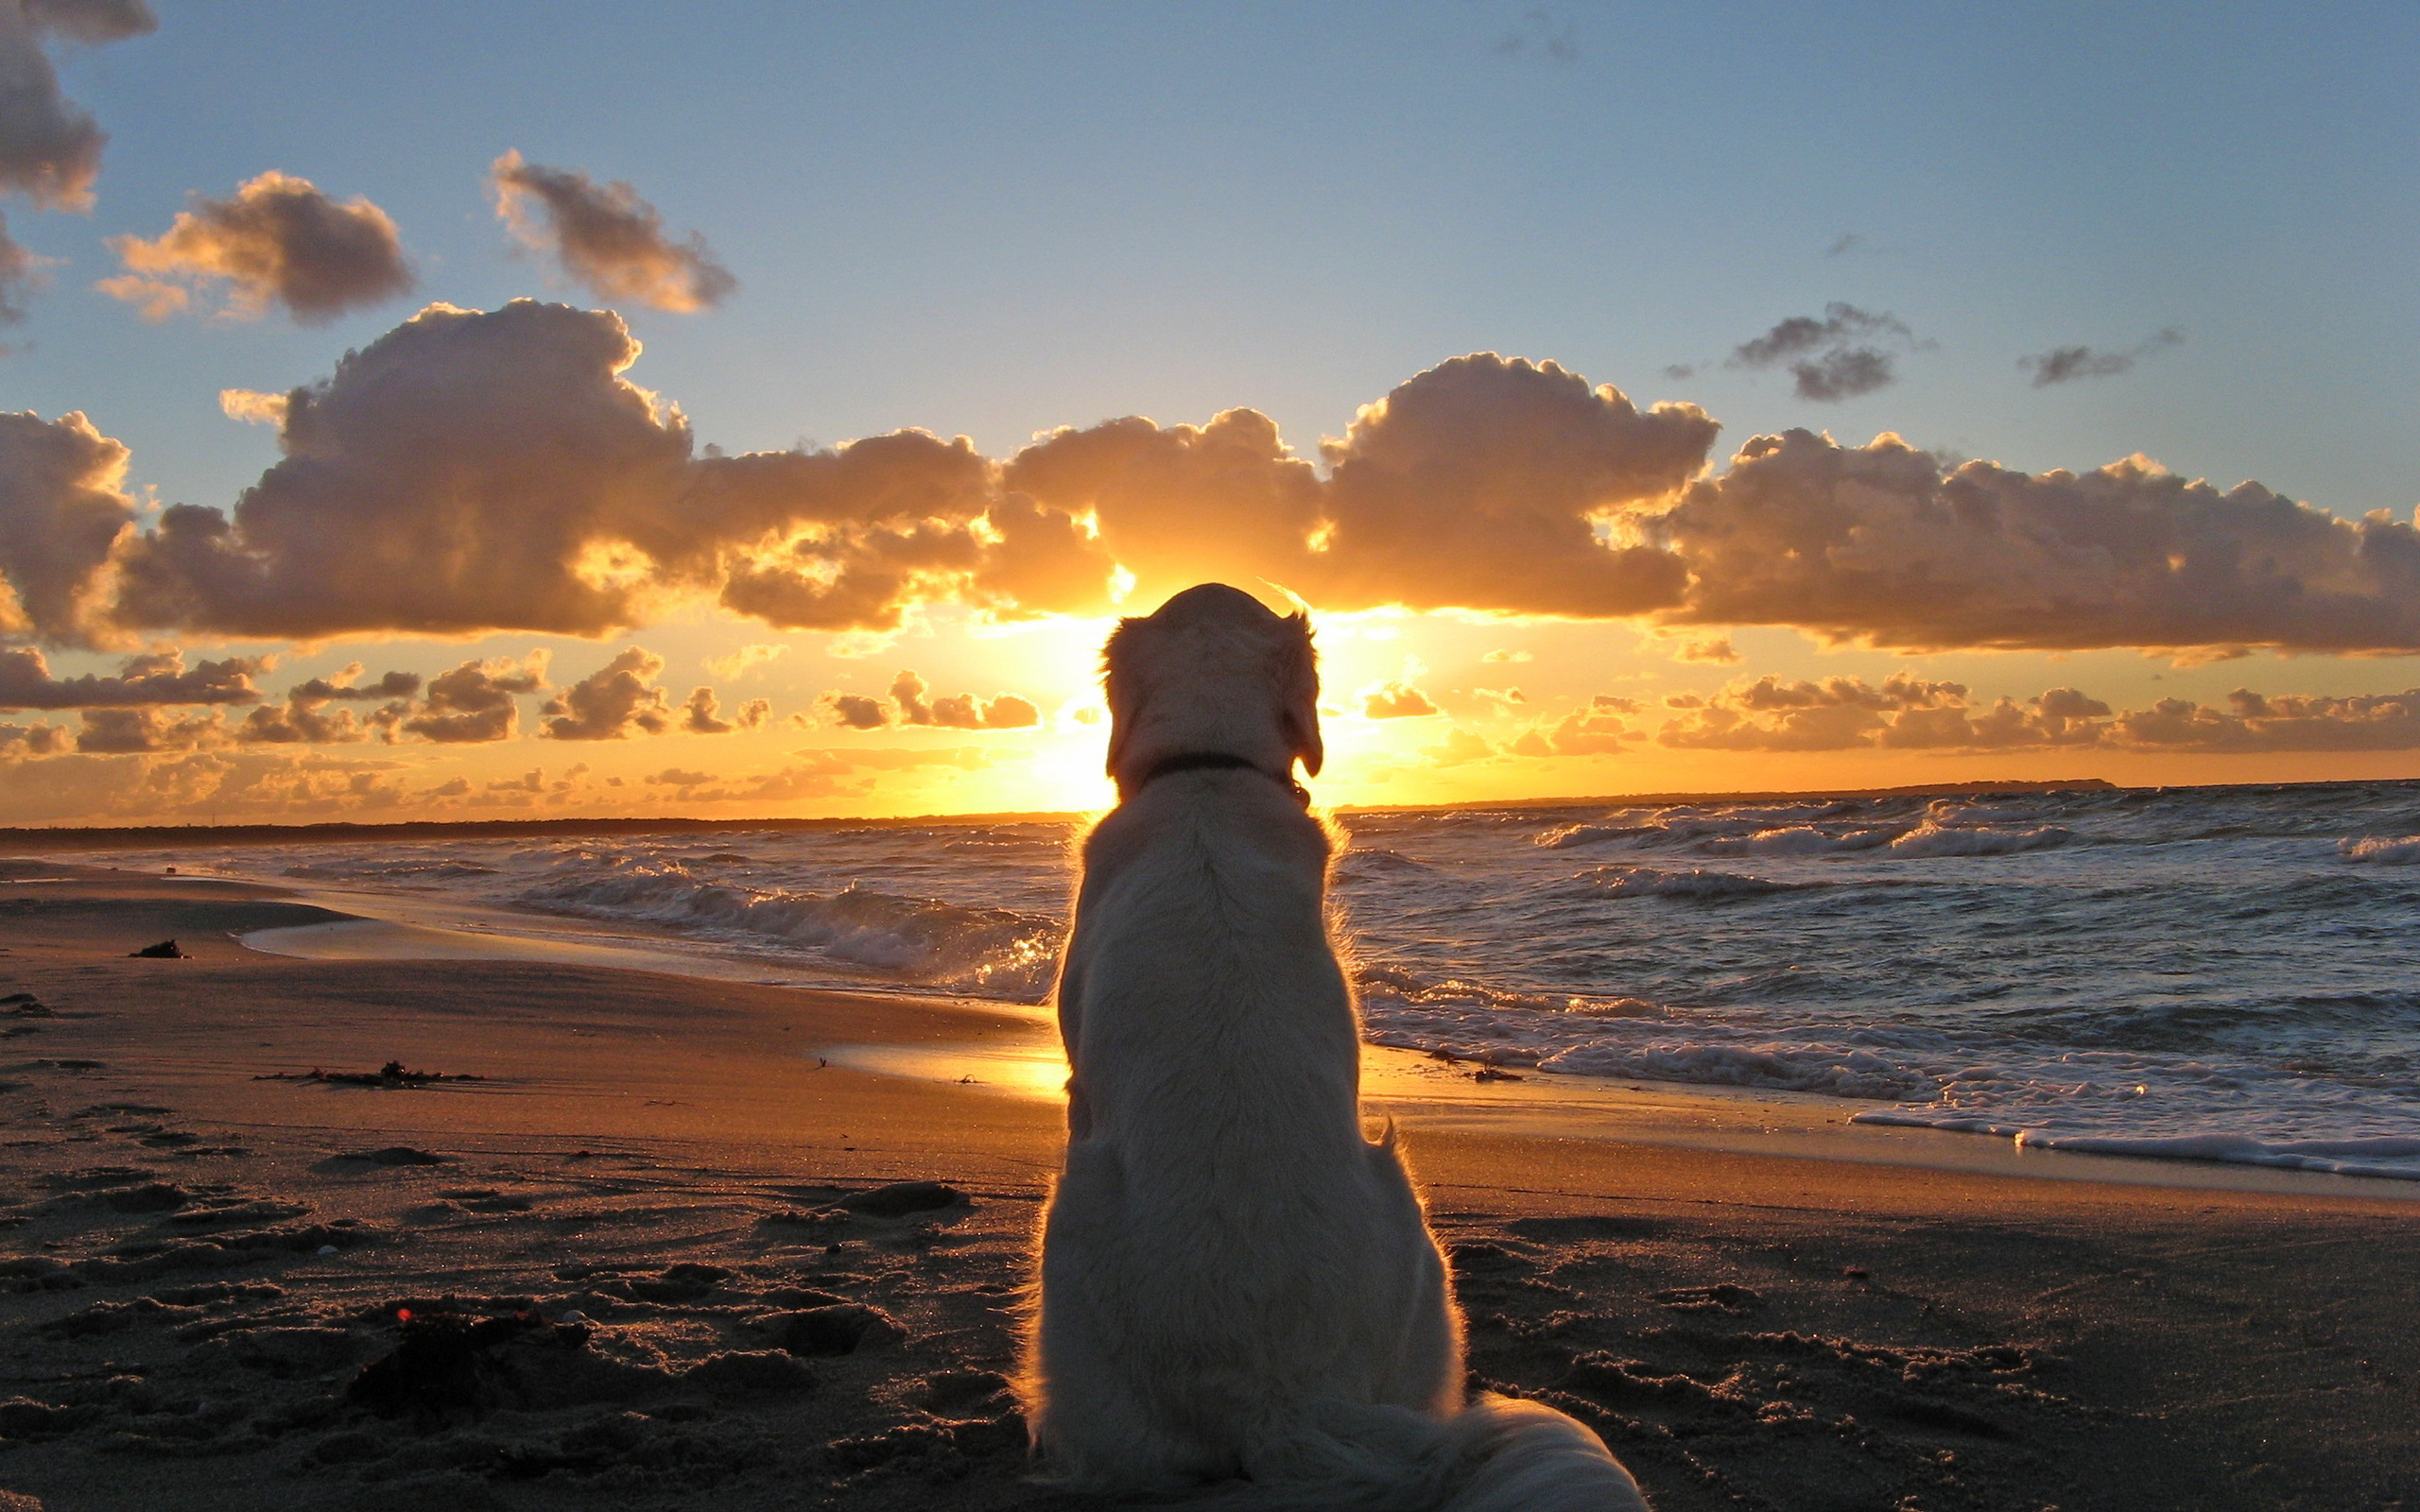 Dog watch Sunset